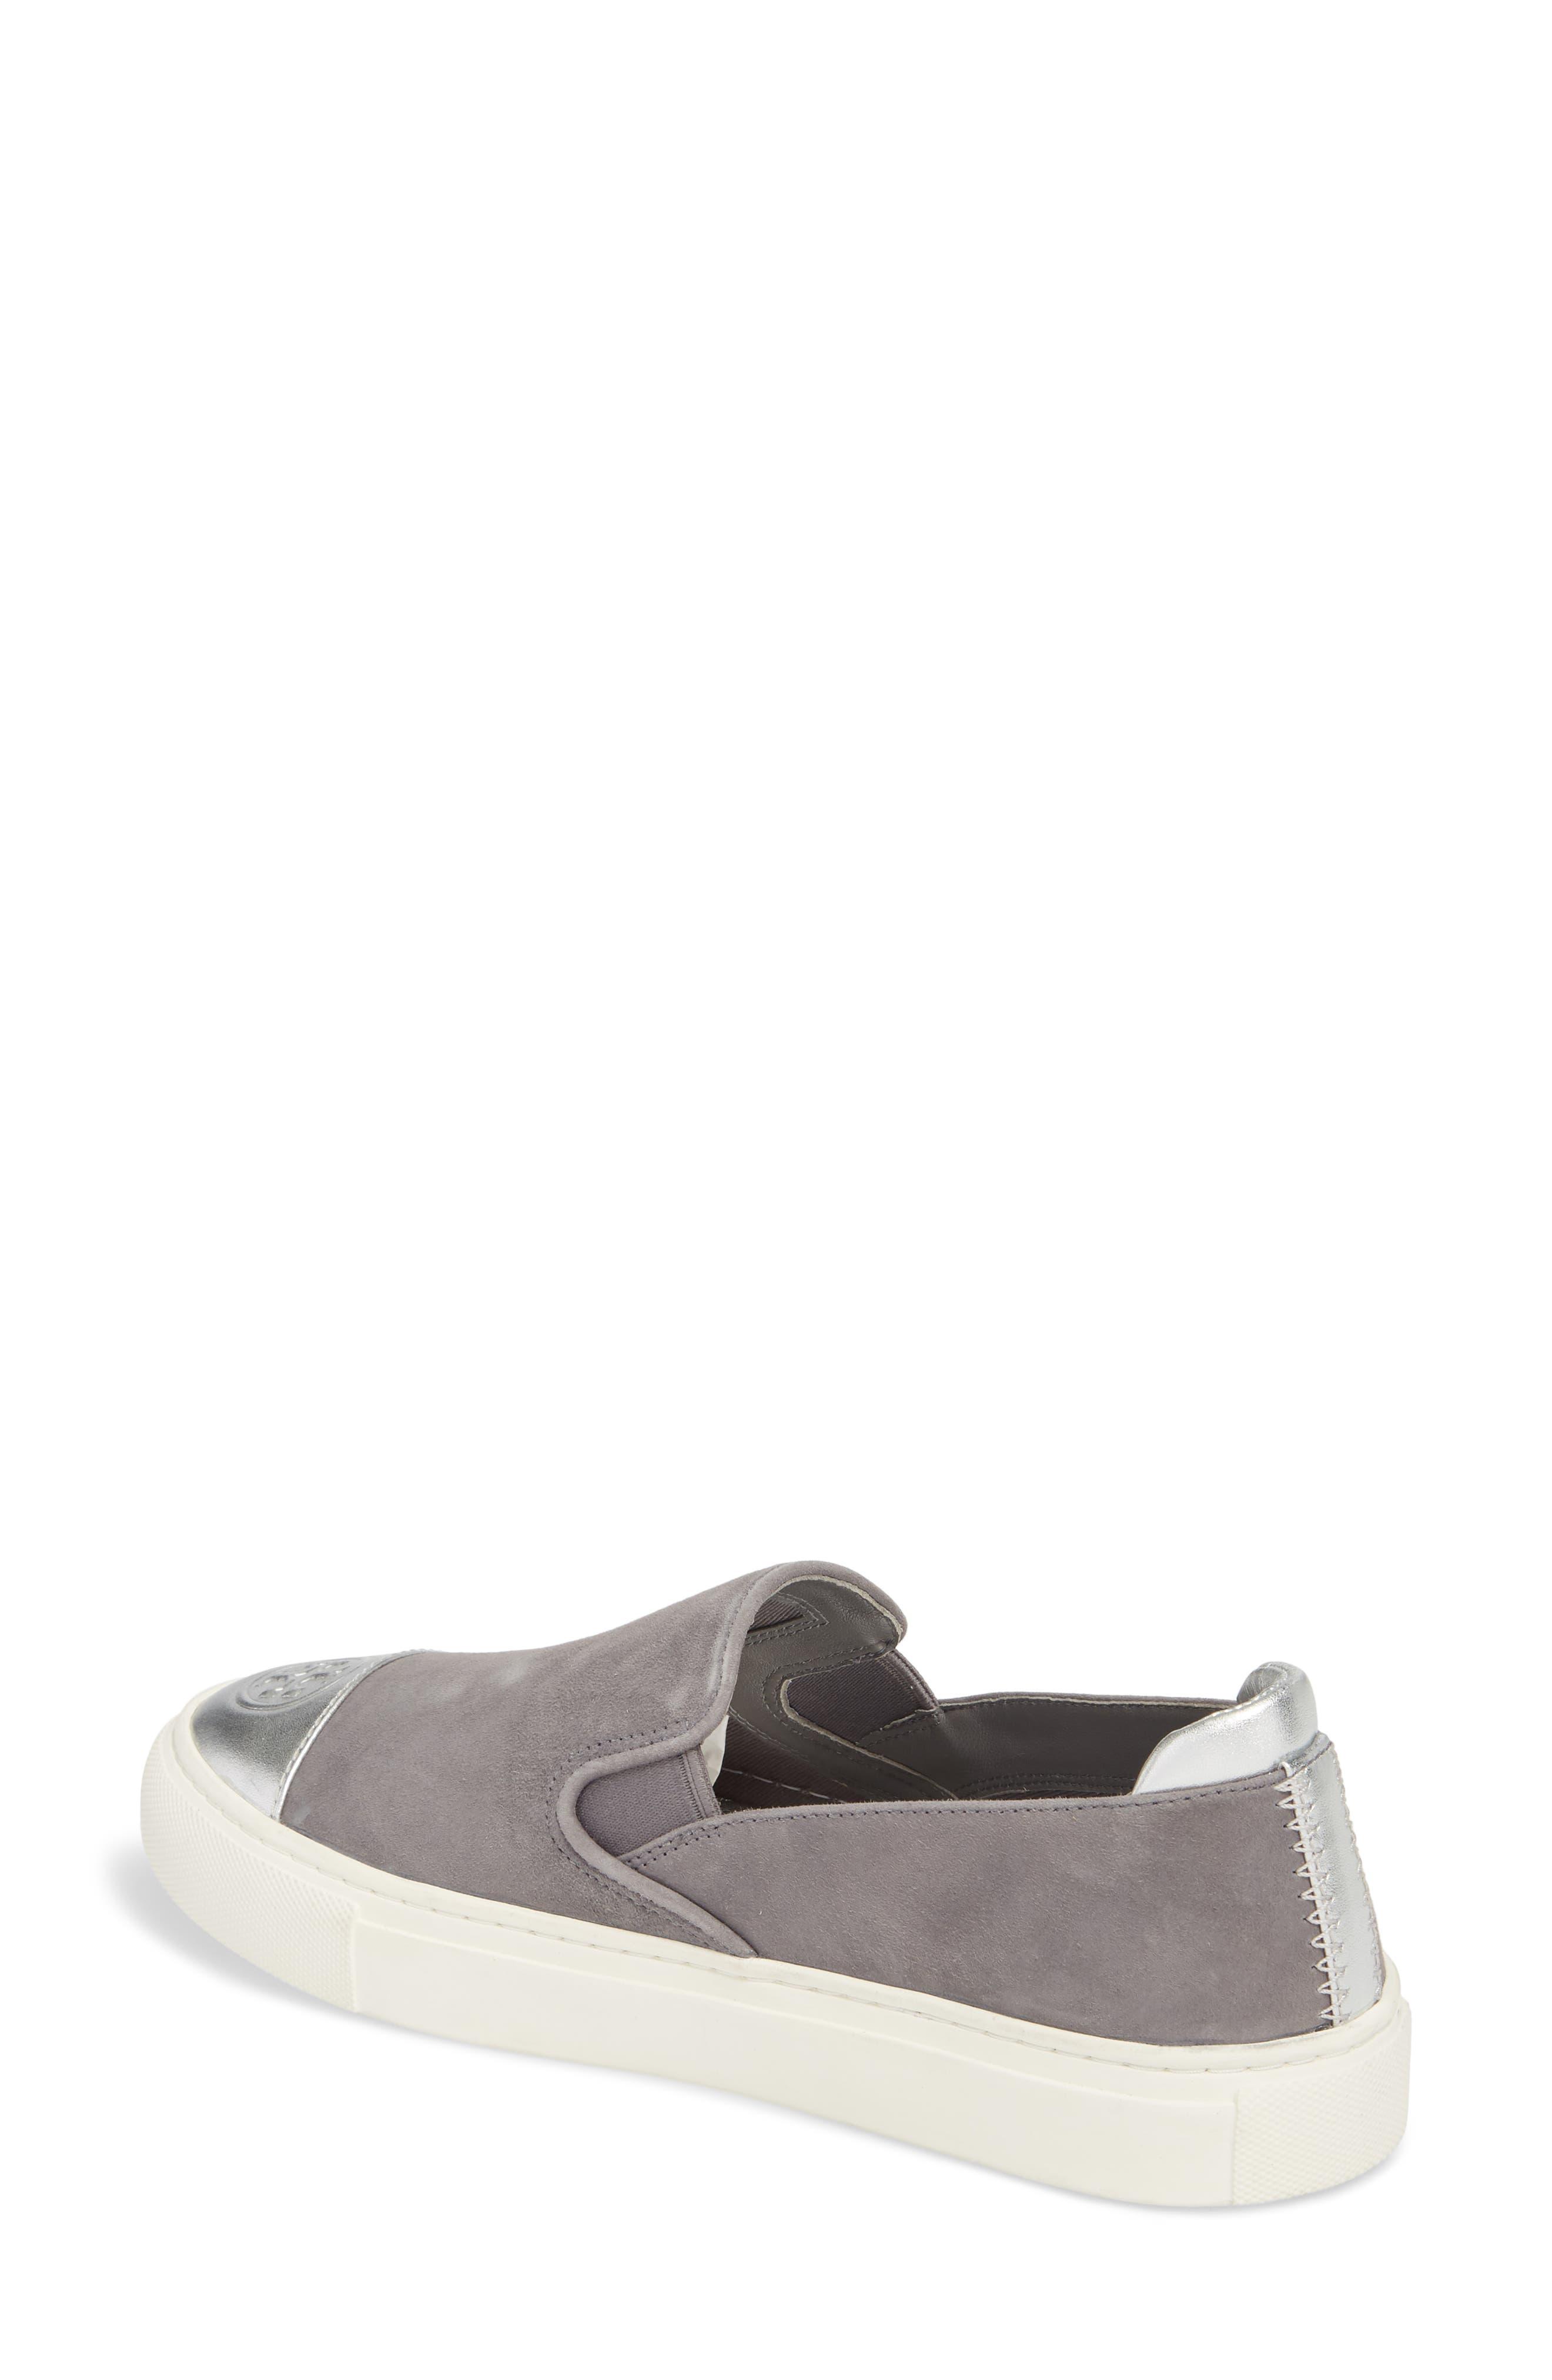 Colorblock Slip-On Sneaker,                             Alternate thumbnail 2, color,                             CARBON/ SILVER